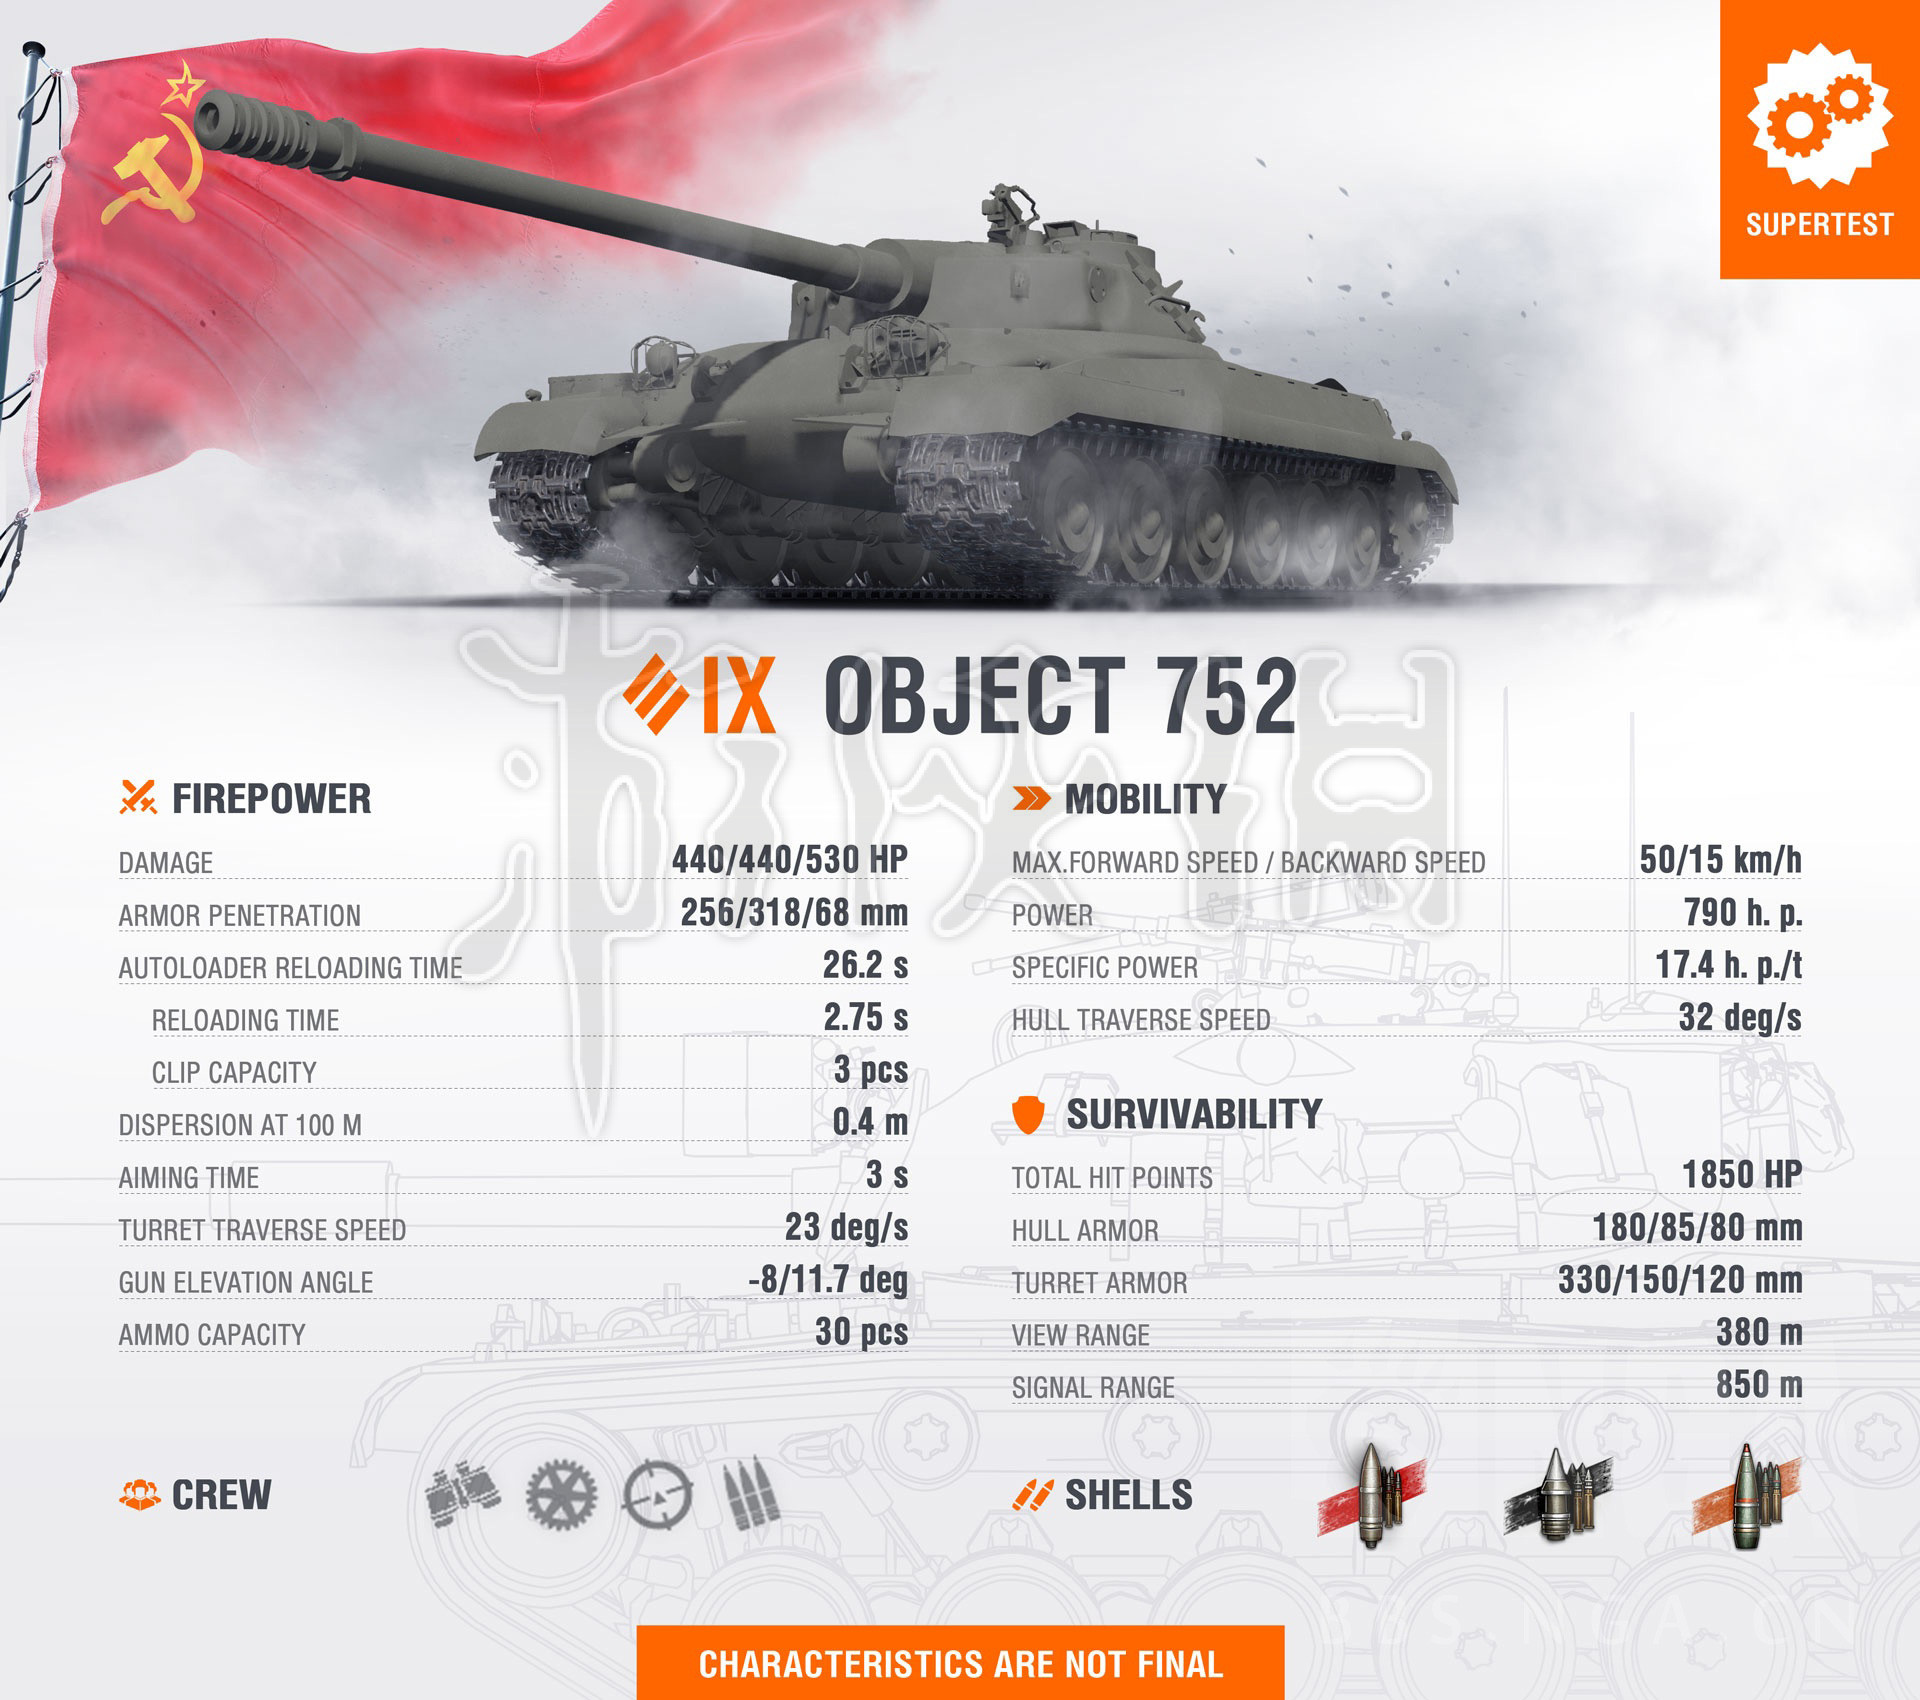 WOT苏联重坦Object752好用吗WOT苏联重坦Object752数据一览